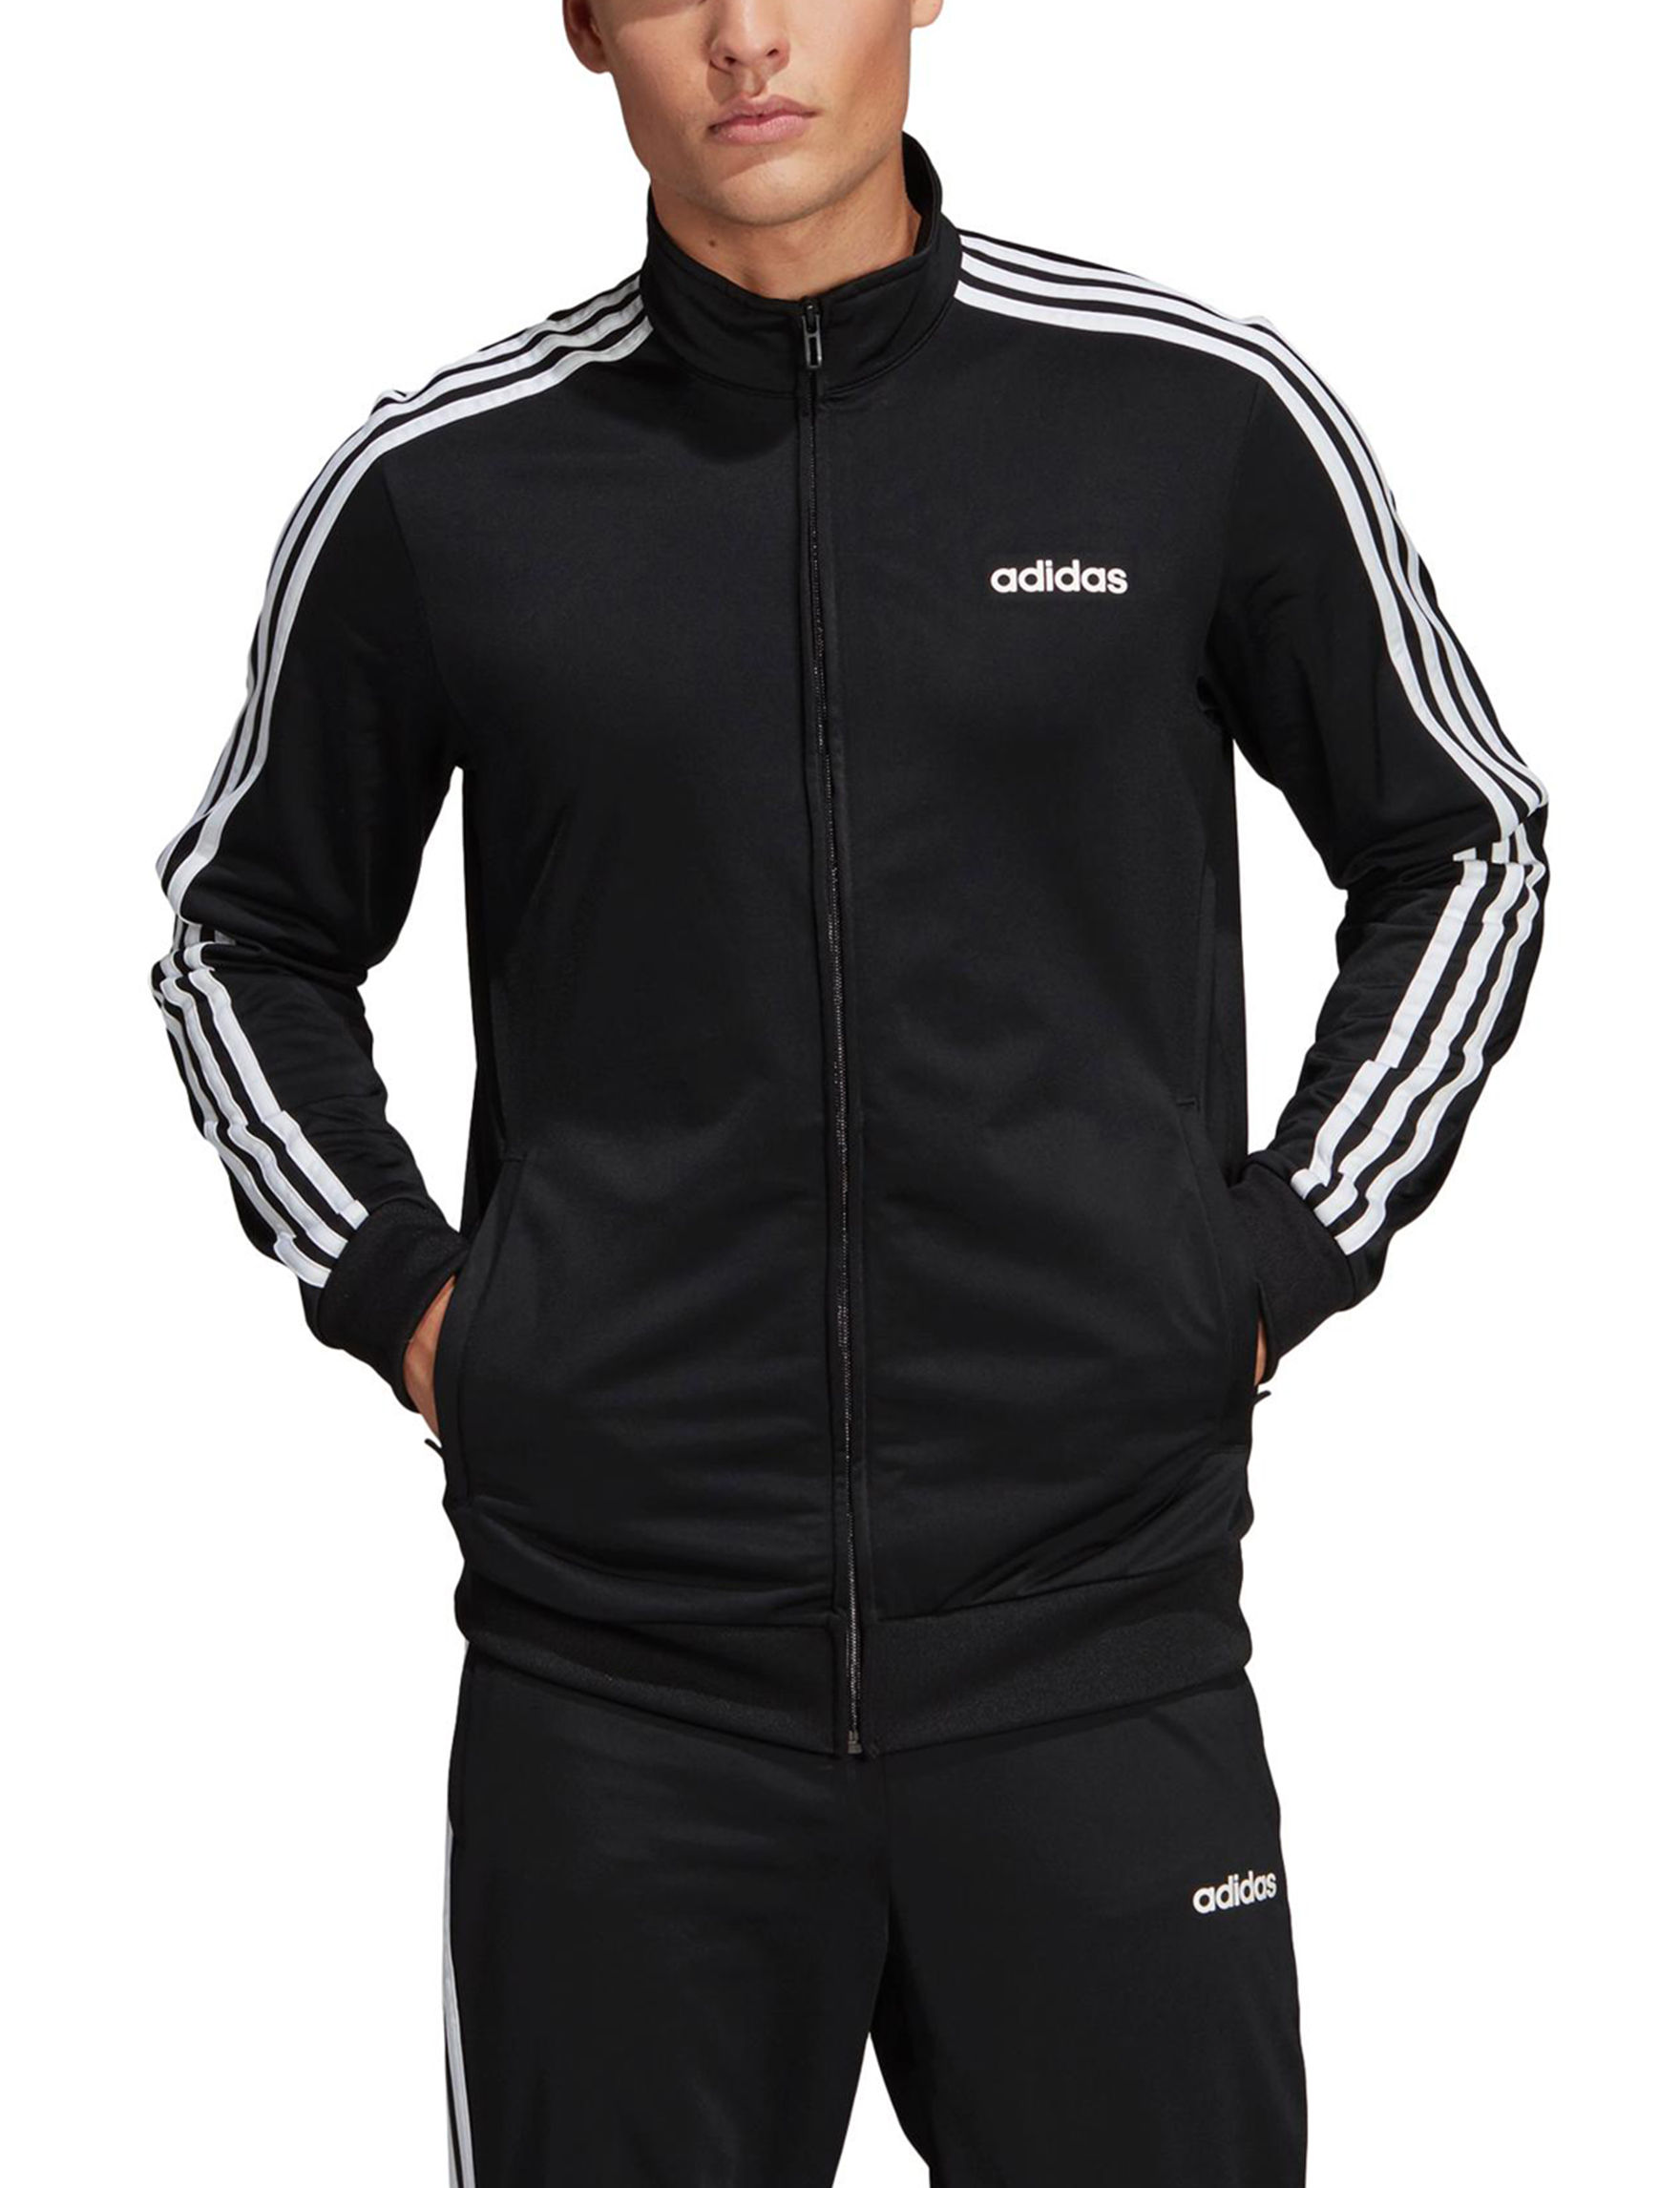 Adidas Black /  White Lightweight Jackets & Blazers